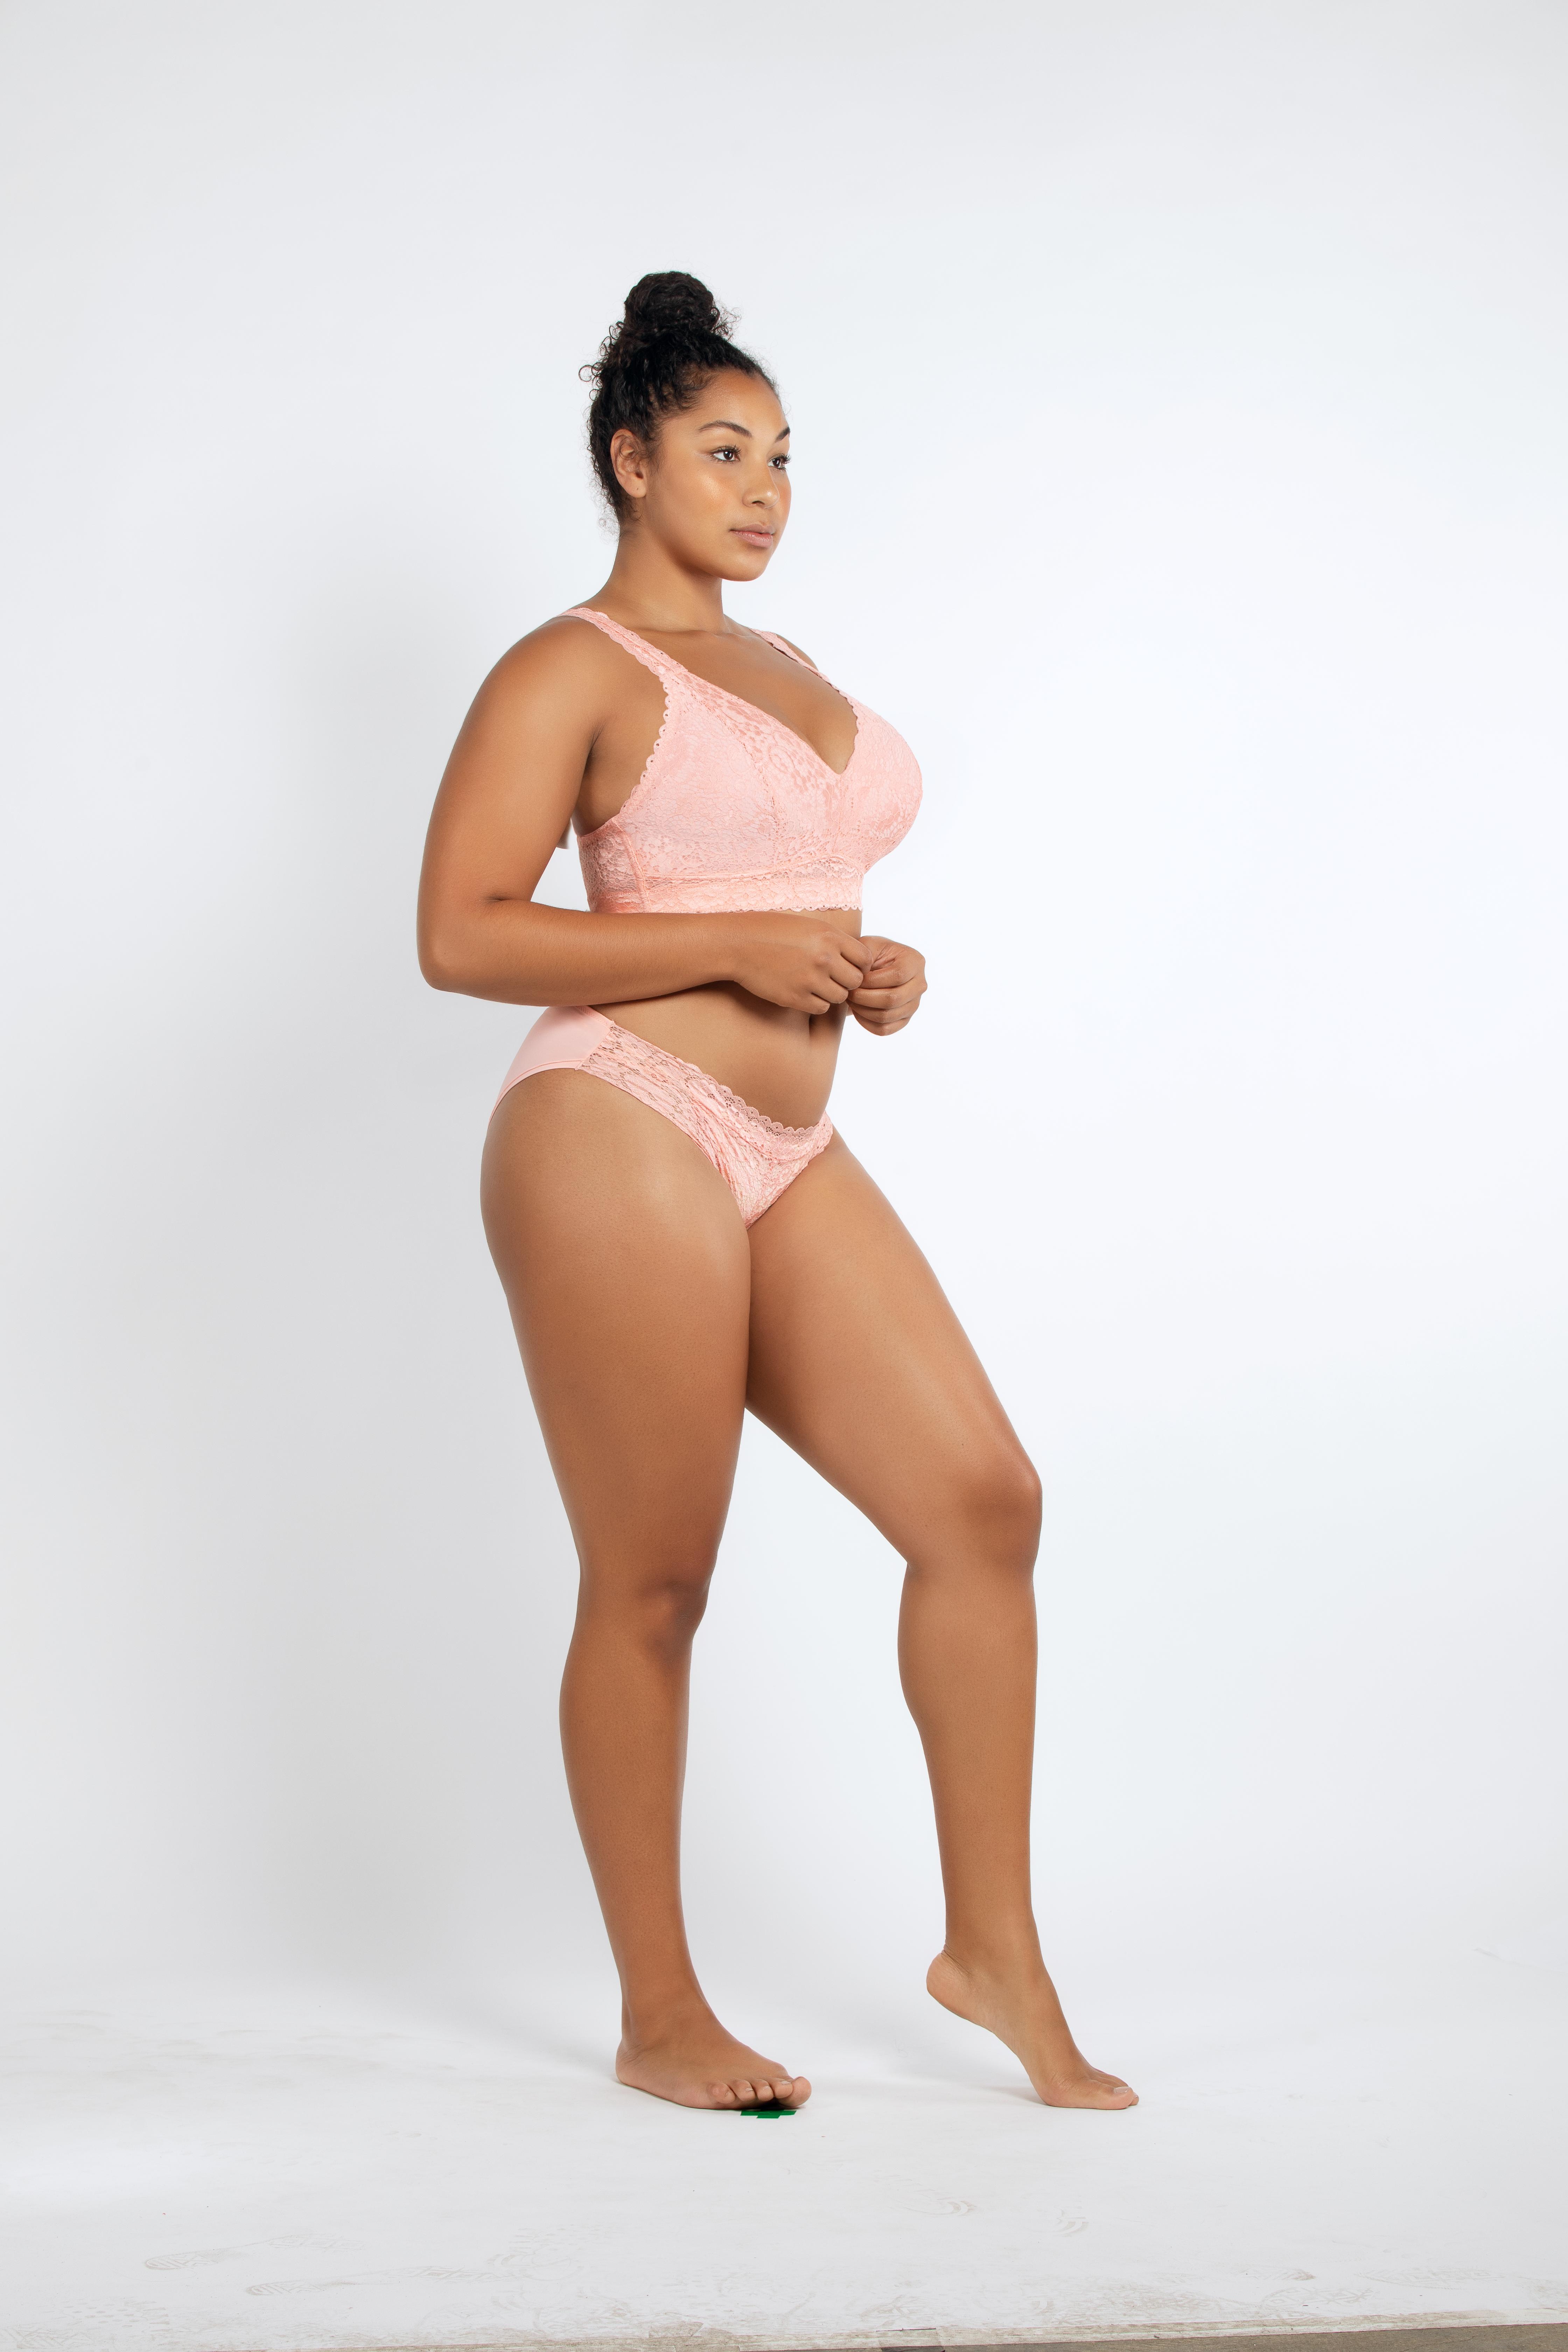 PARFAIT Adriana LaceBraletteP5482 BikiniP5483 PeachBud Side2 - Adriana Lace Bralette - Peach Bud - P5482